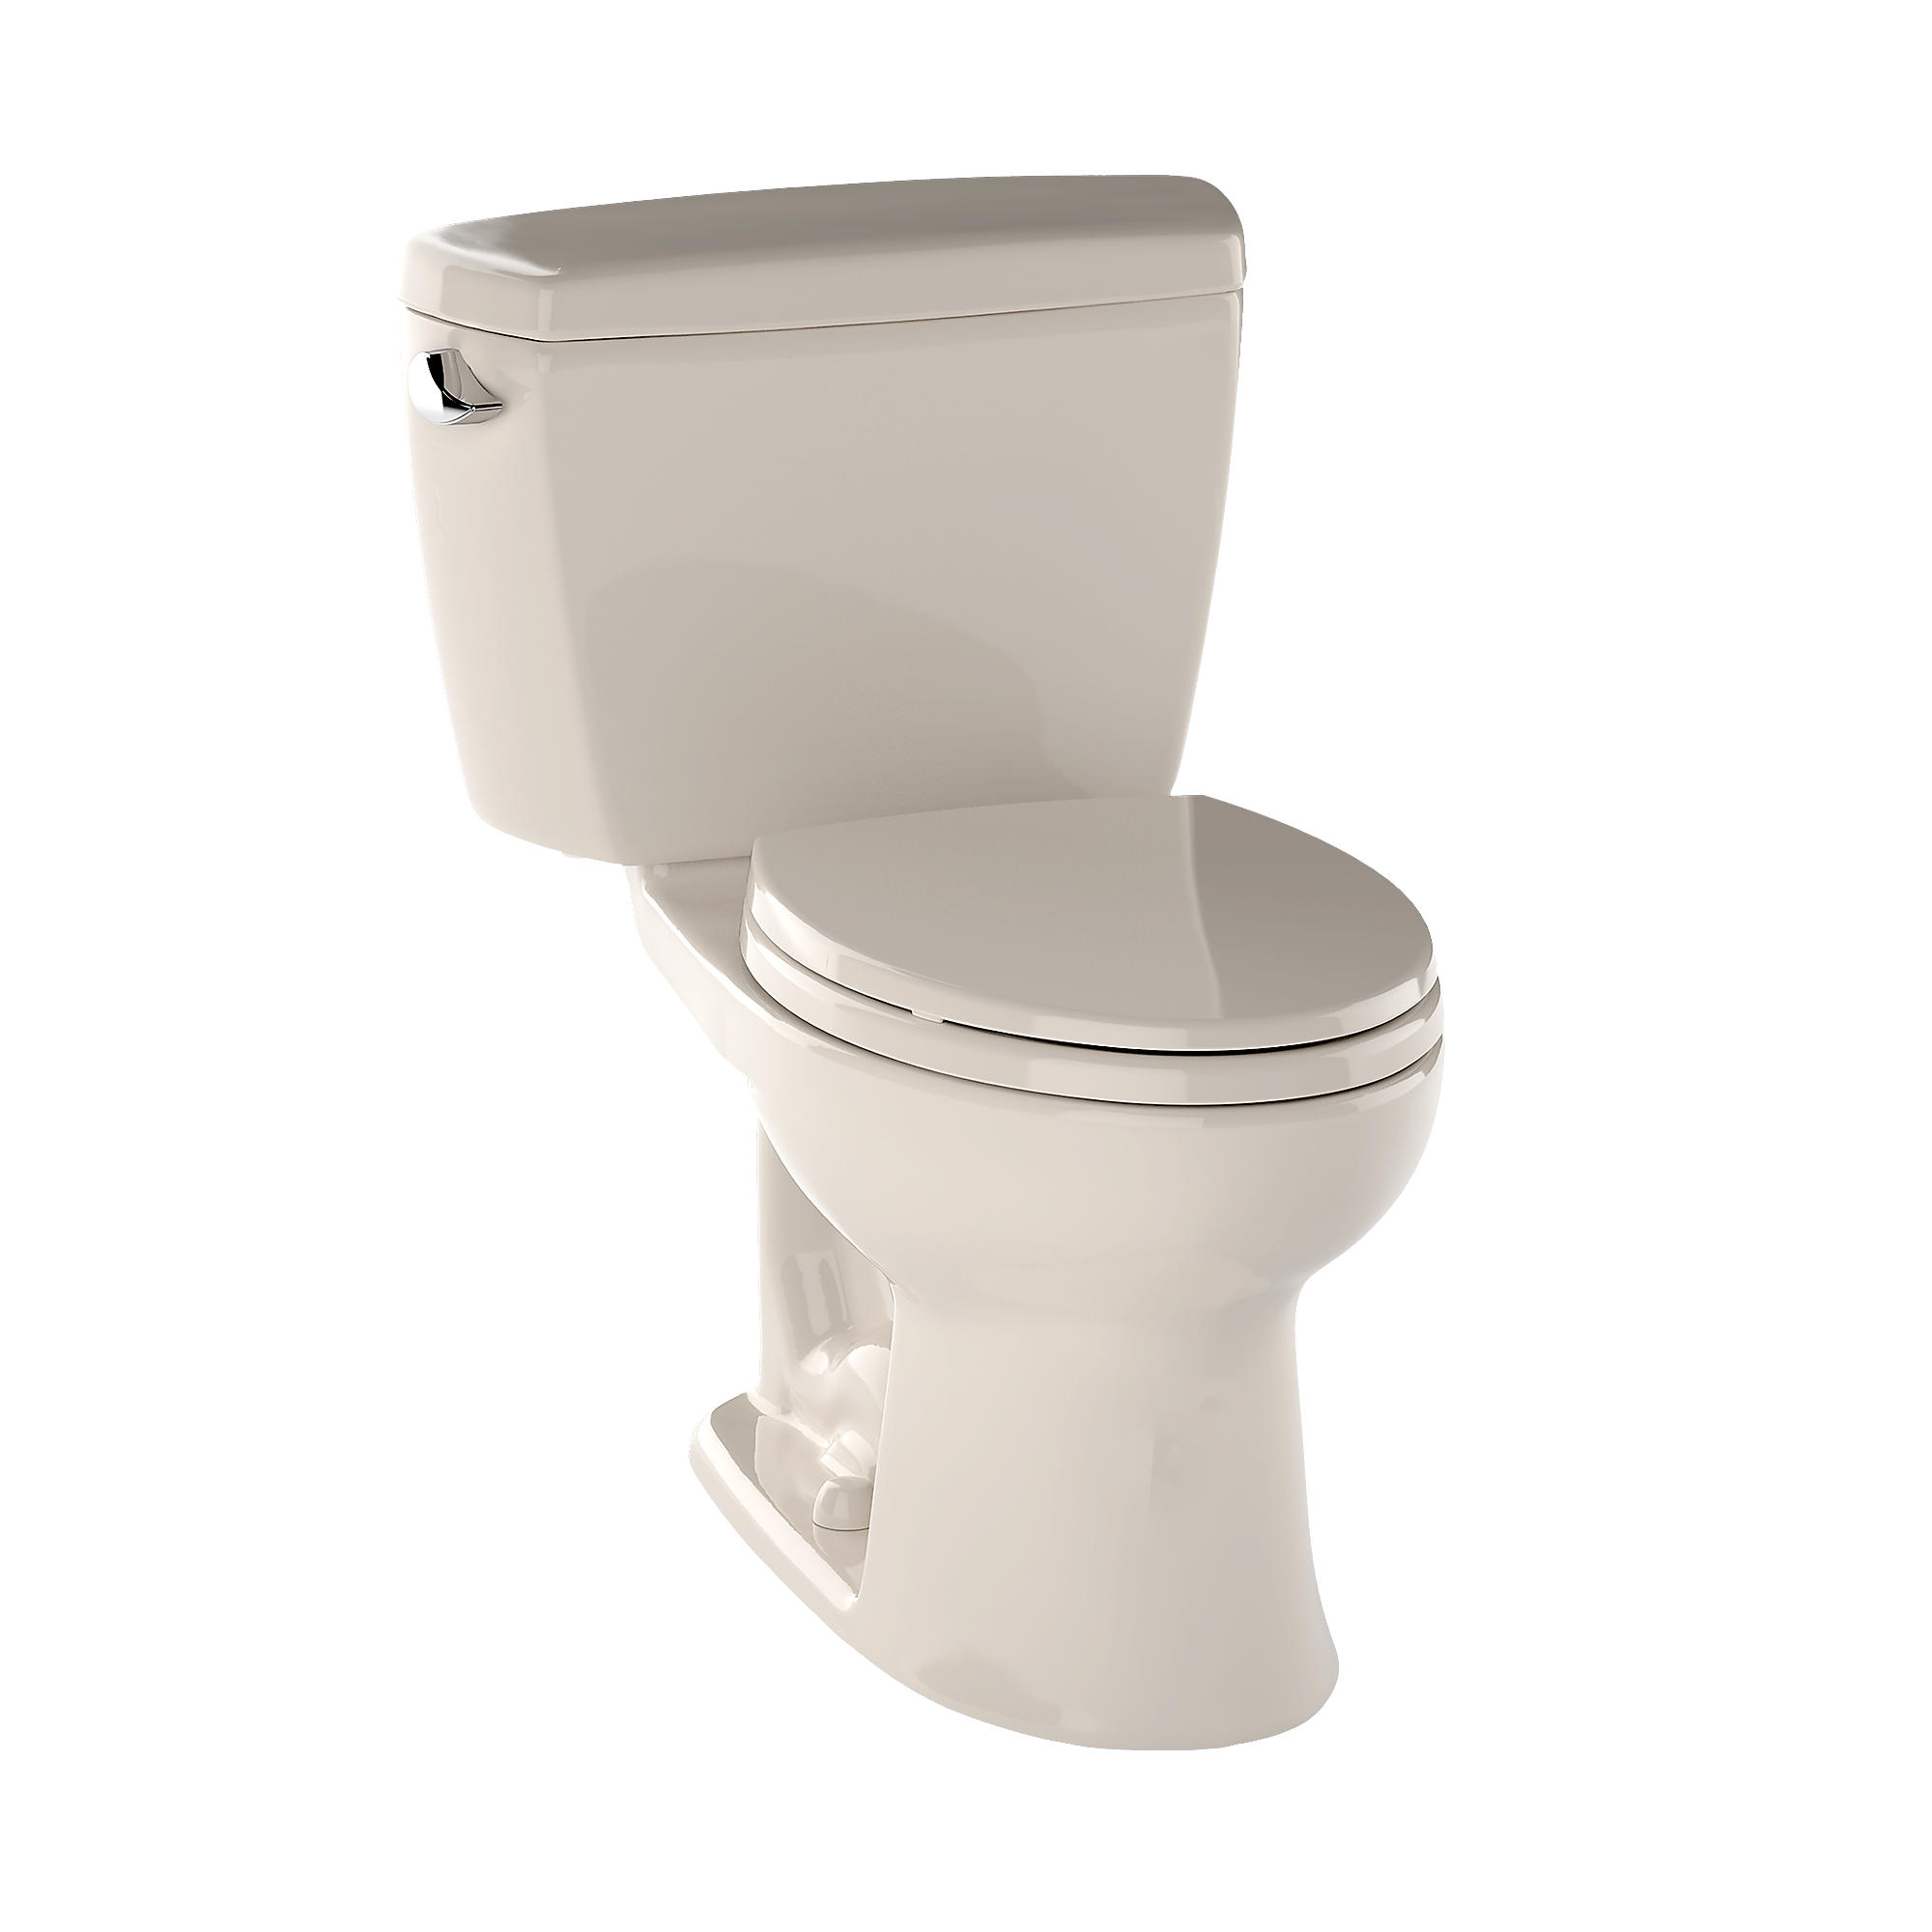 Cst744e 03 eco drake  two piece toilet  1 28 gpf  elongated bowl 0